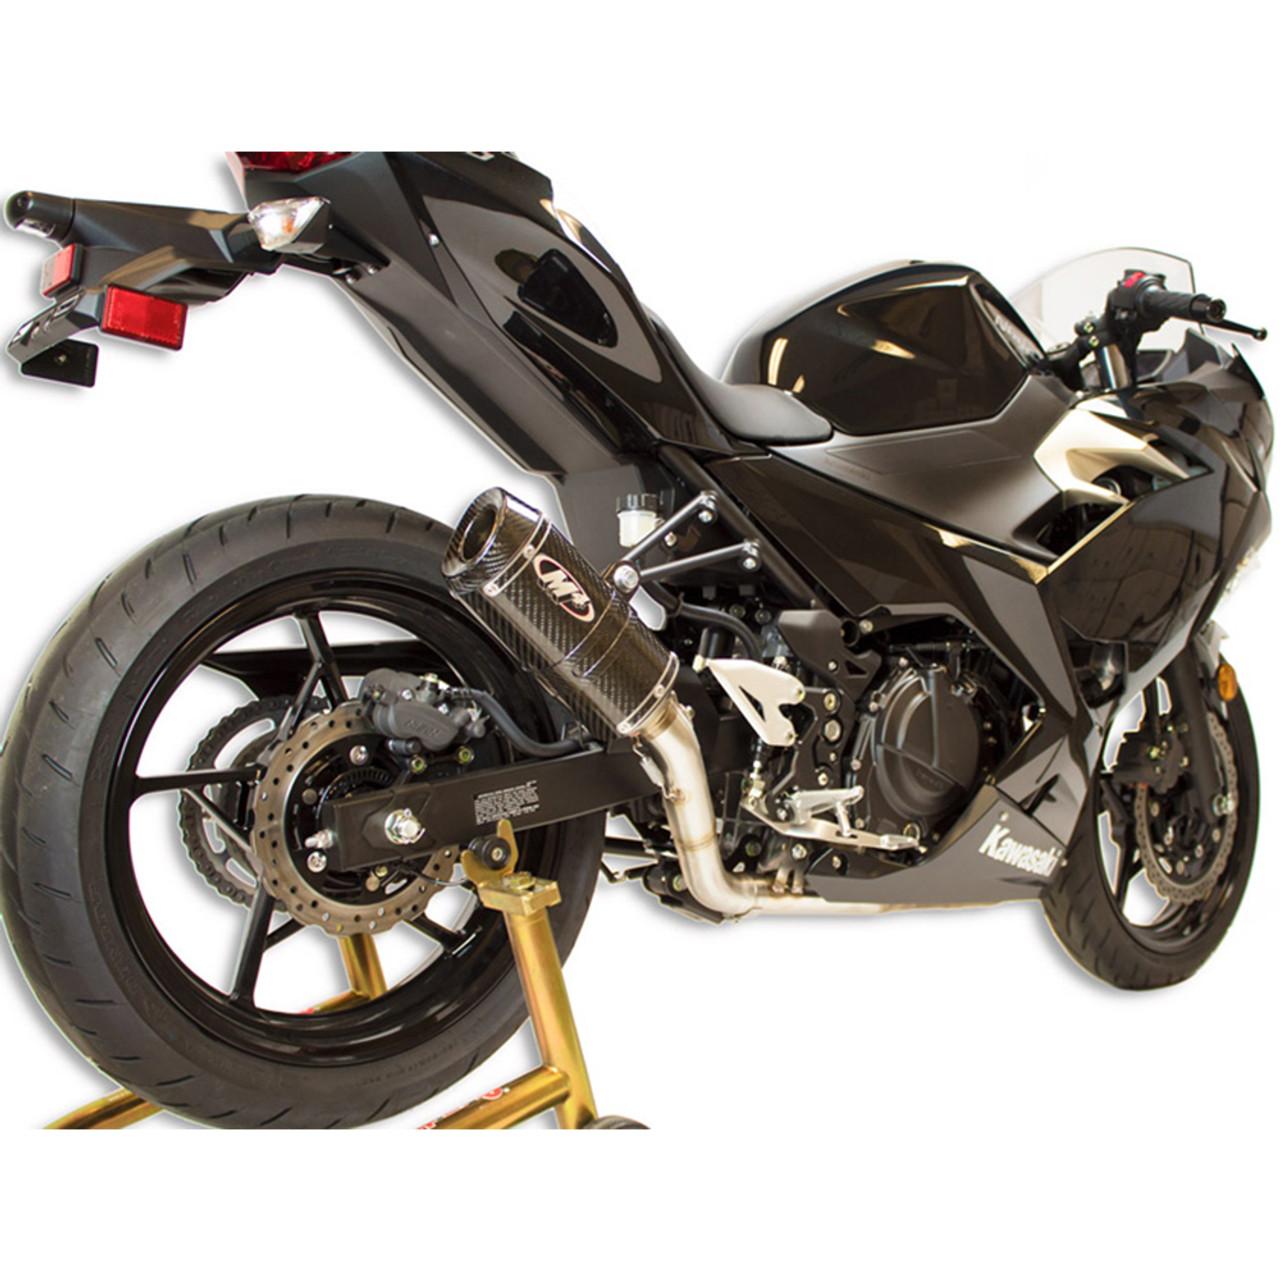 m4 kawasaki ninja 400 18 21 full exhaust x96 carbon canister